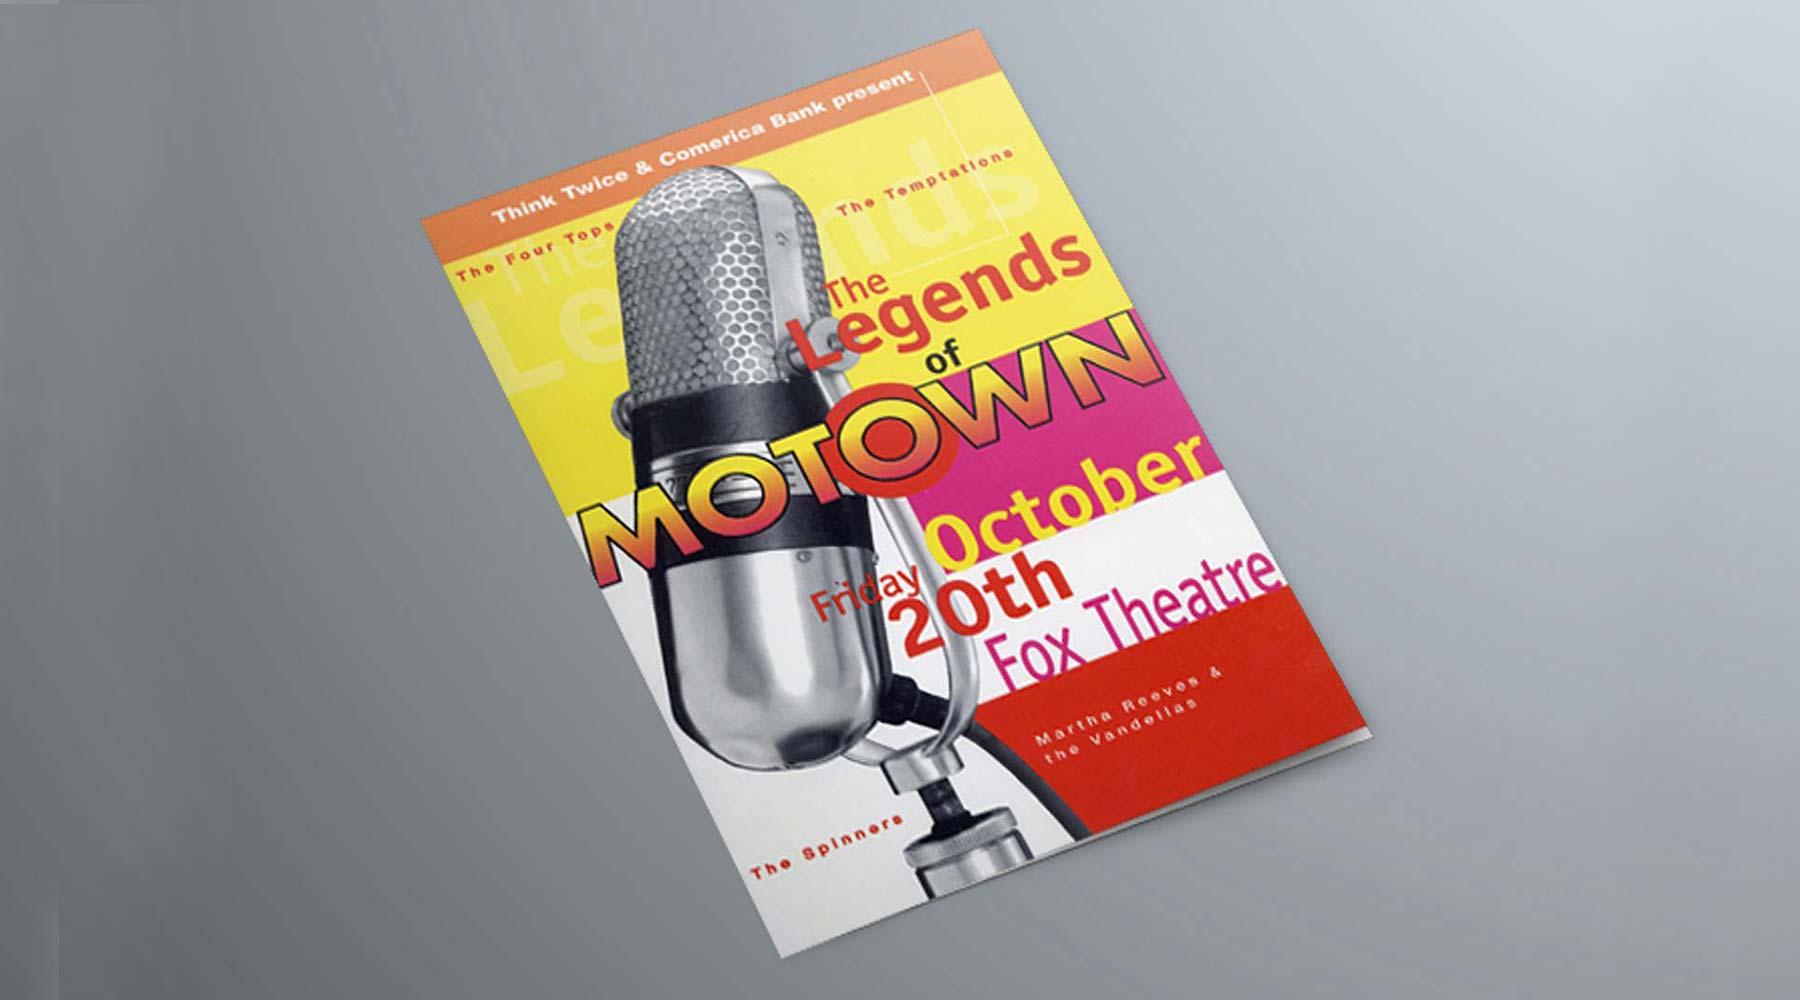 Vintage Motown Concert Invitation